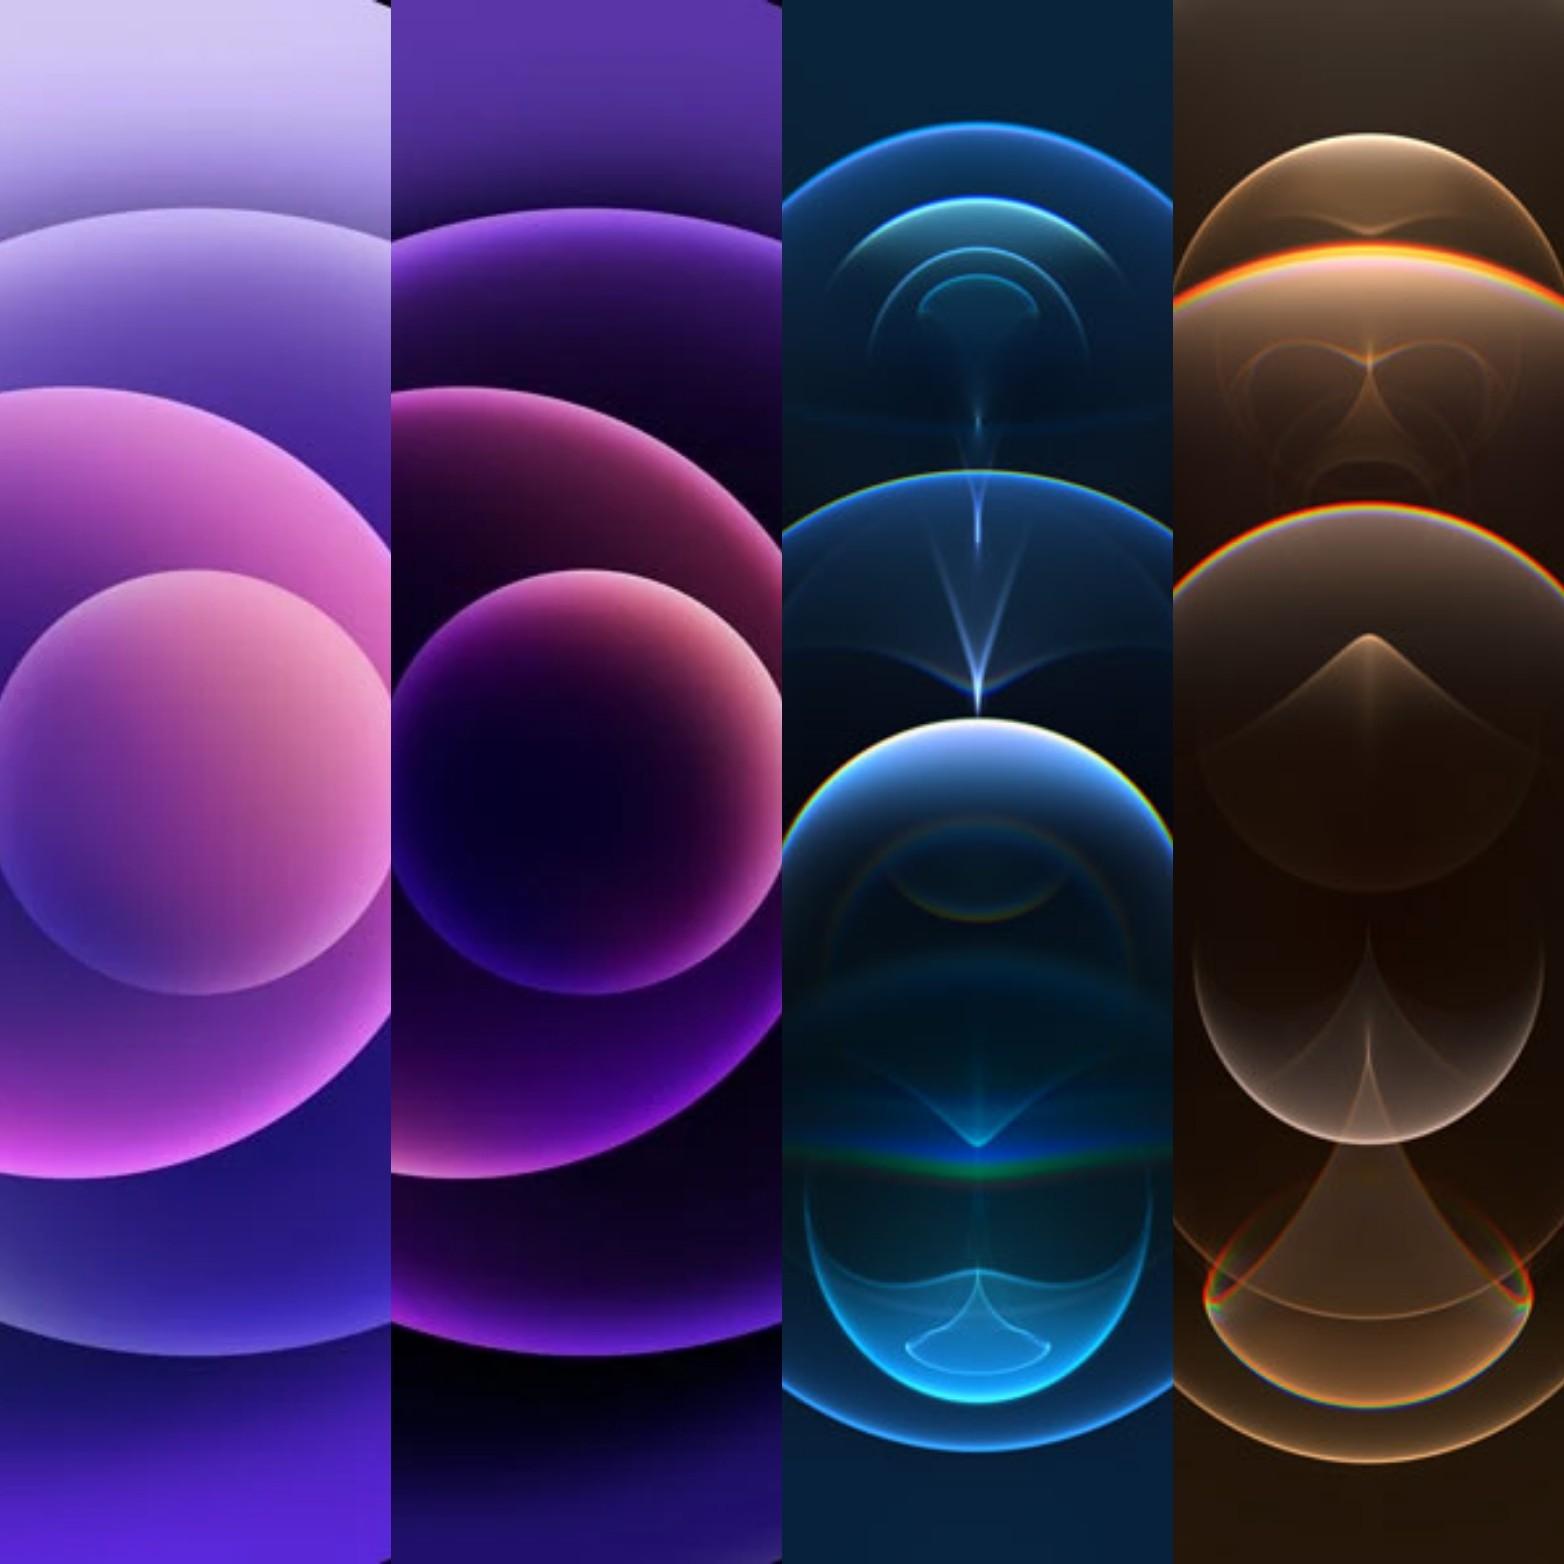 Iphonr 12 Purple Wallpapers